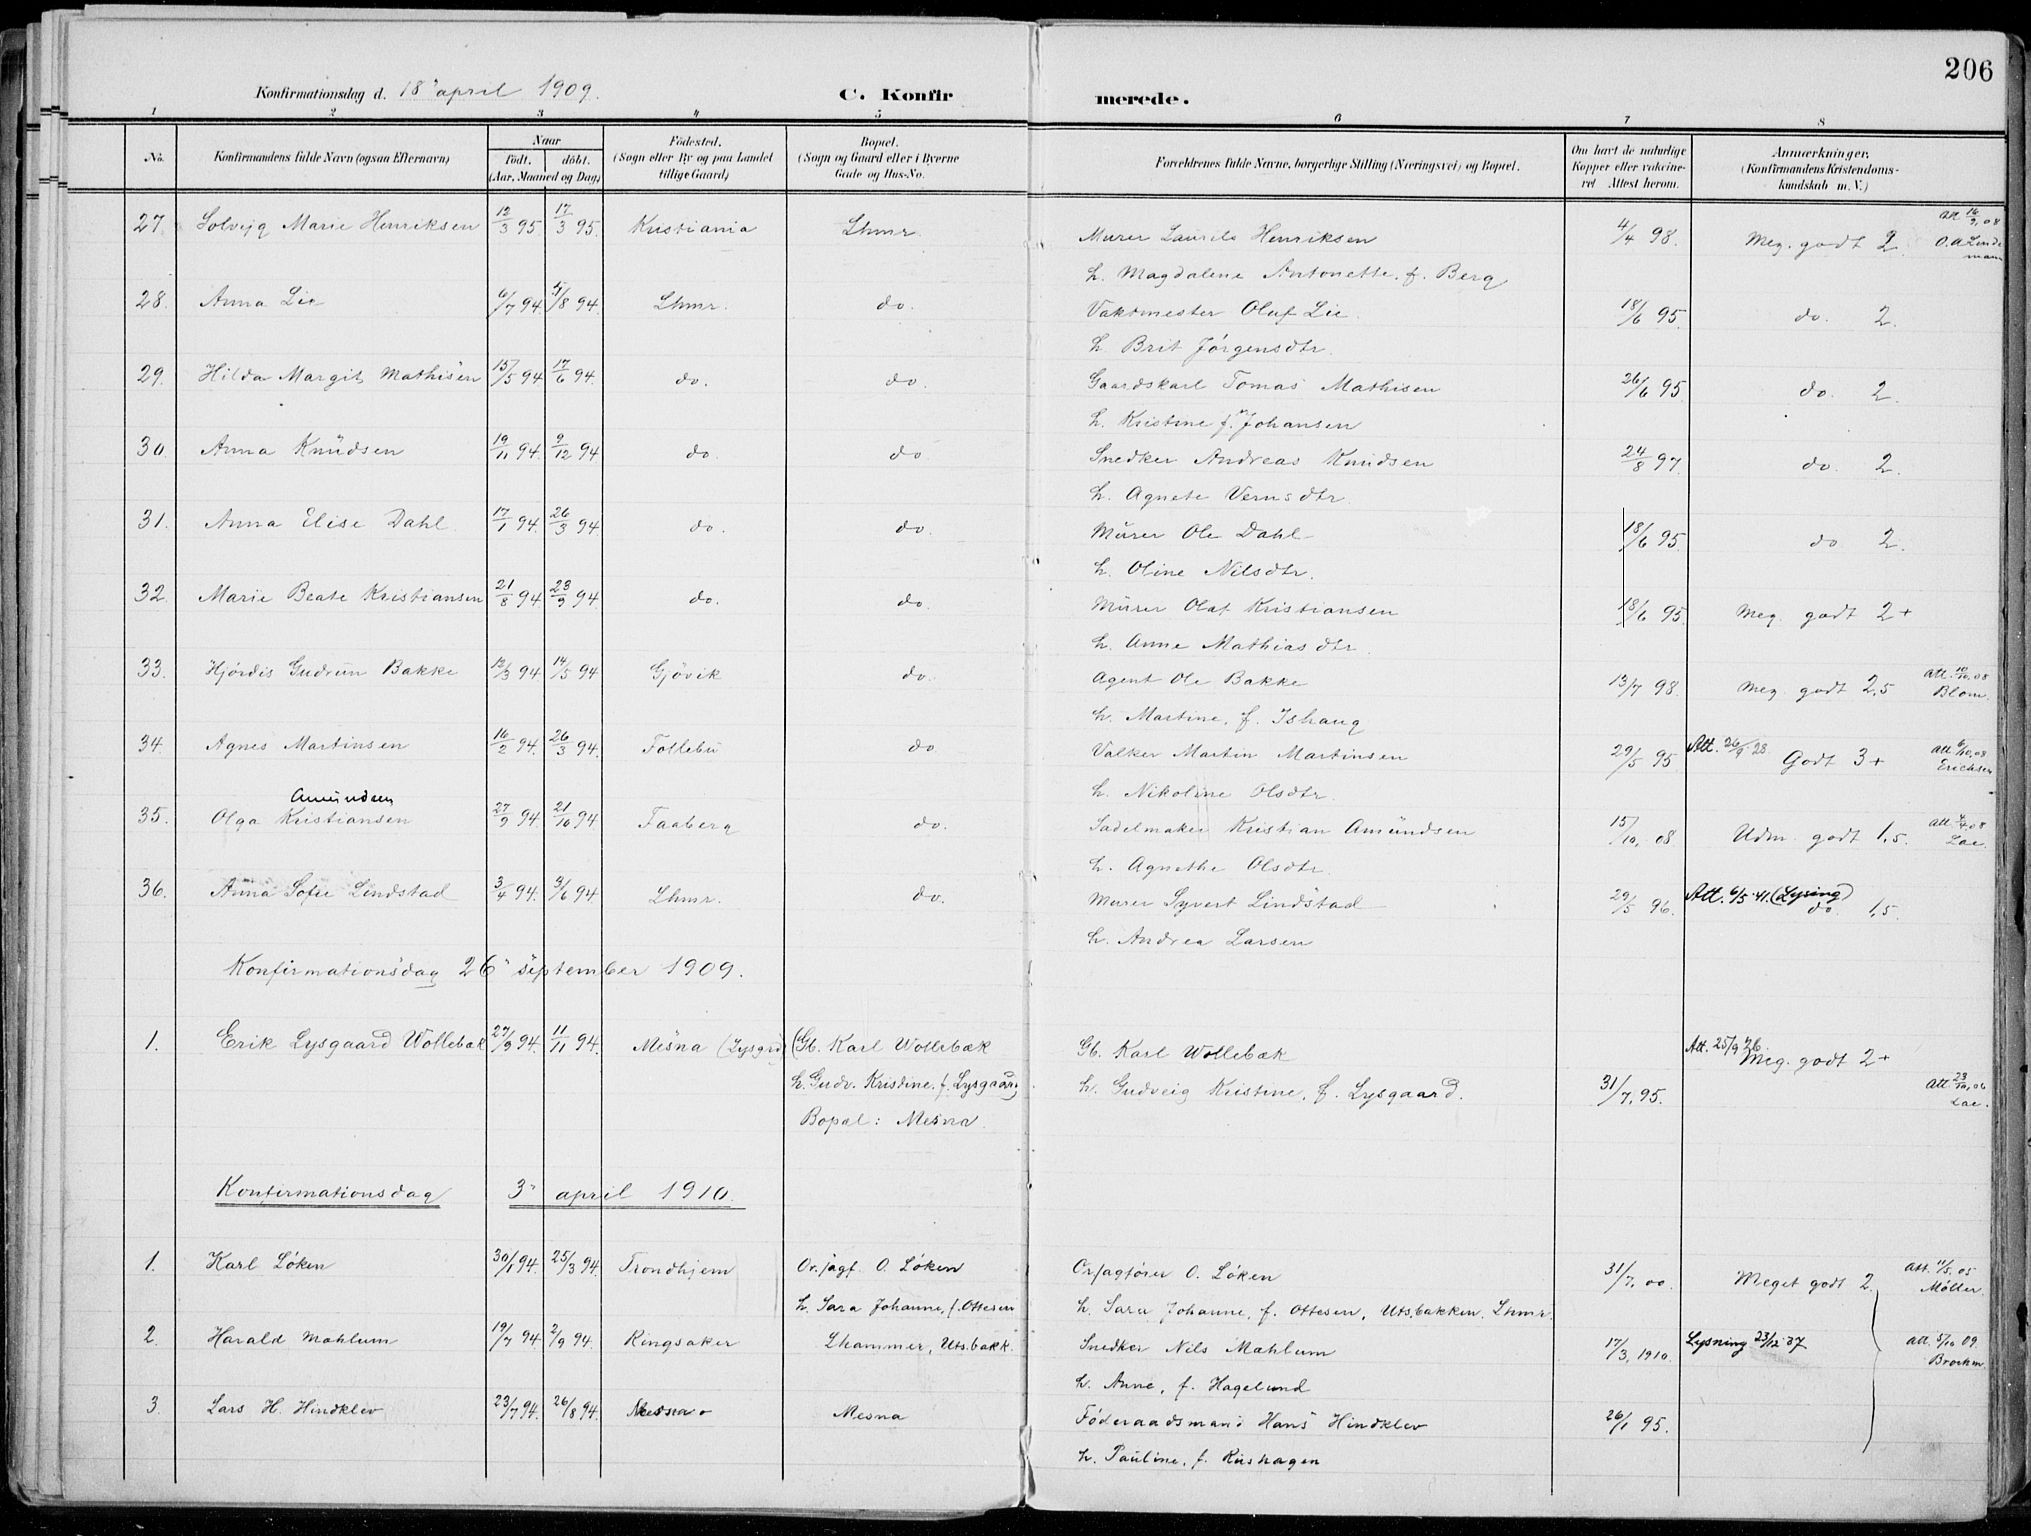 SAH, Lillehammer prestekontor, Ministerialbok nr. 1, 1901-1916, s. 206